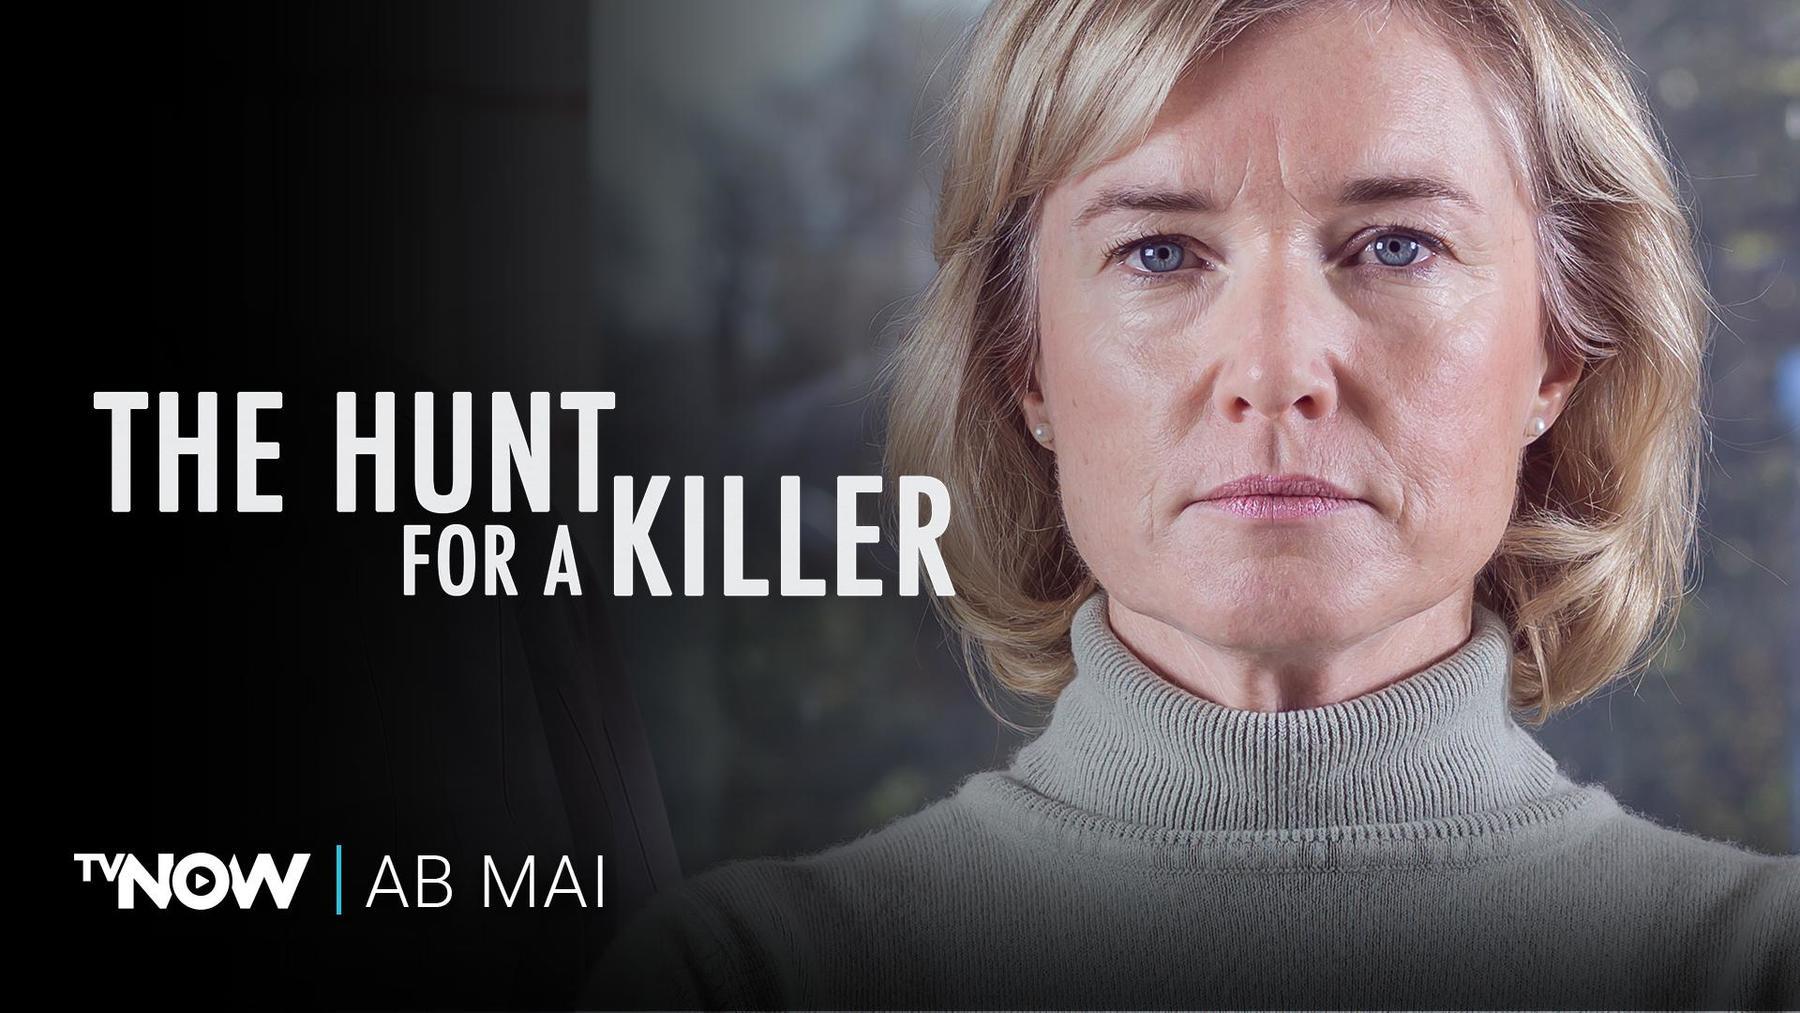 The Hunt for a Killer